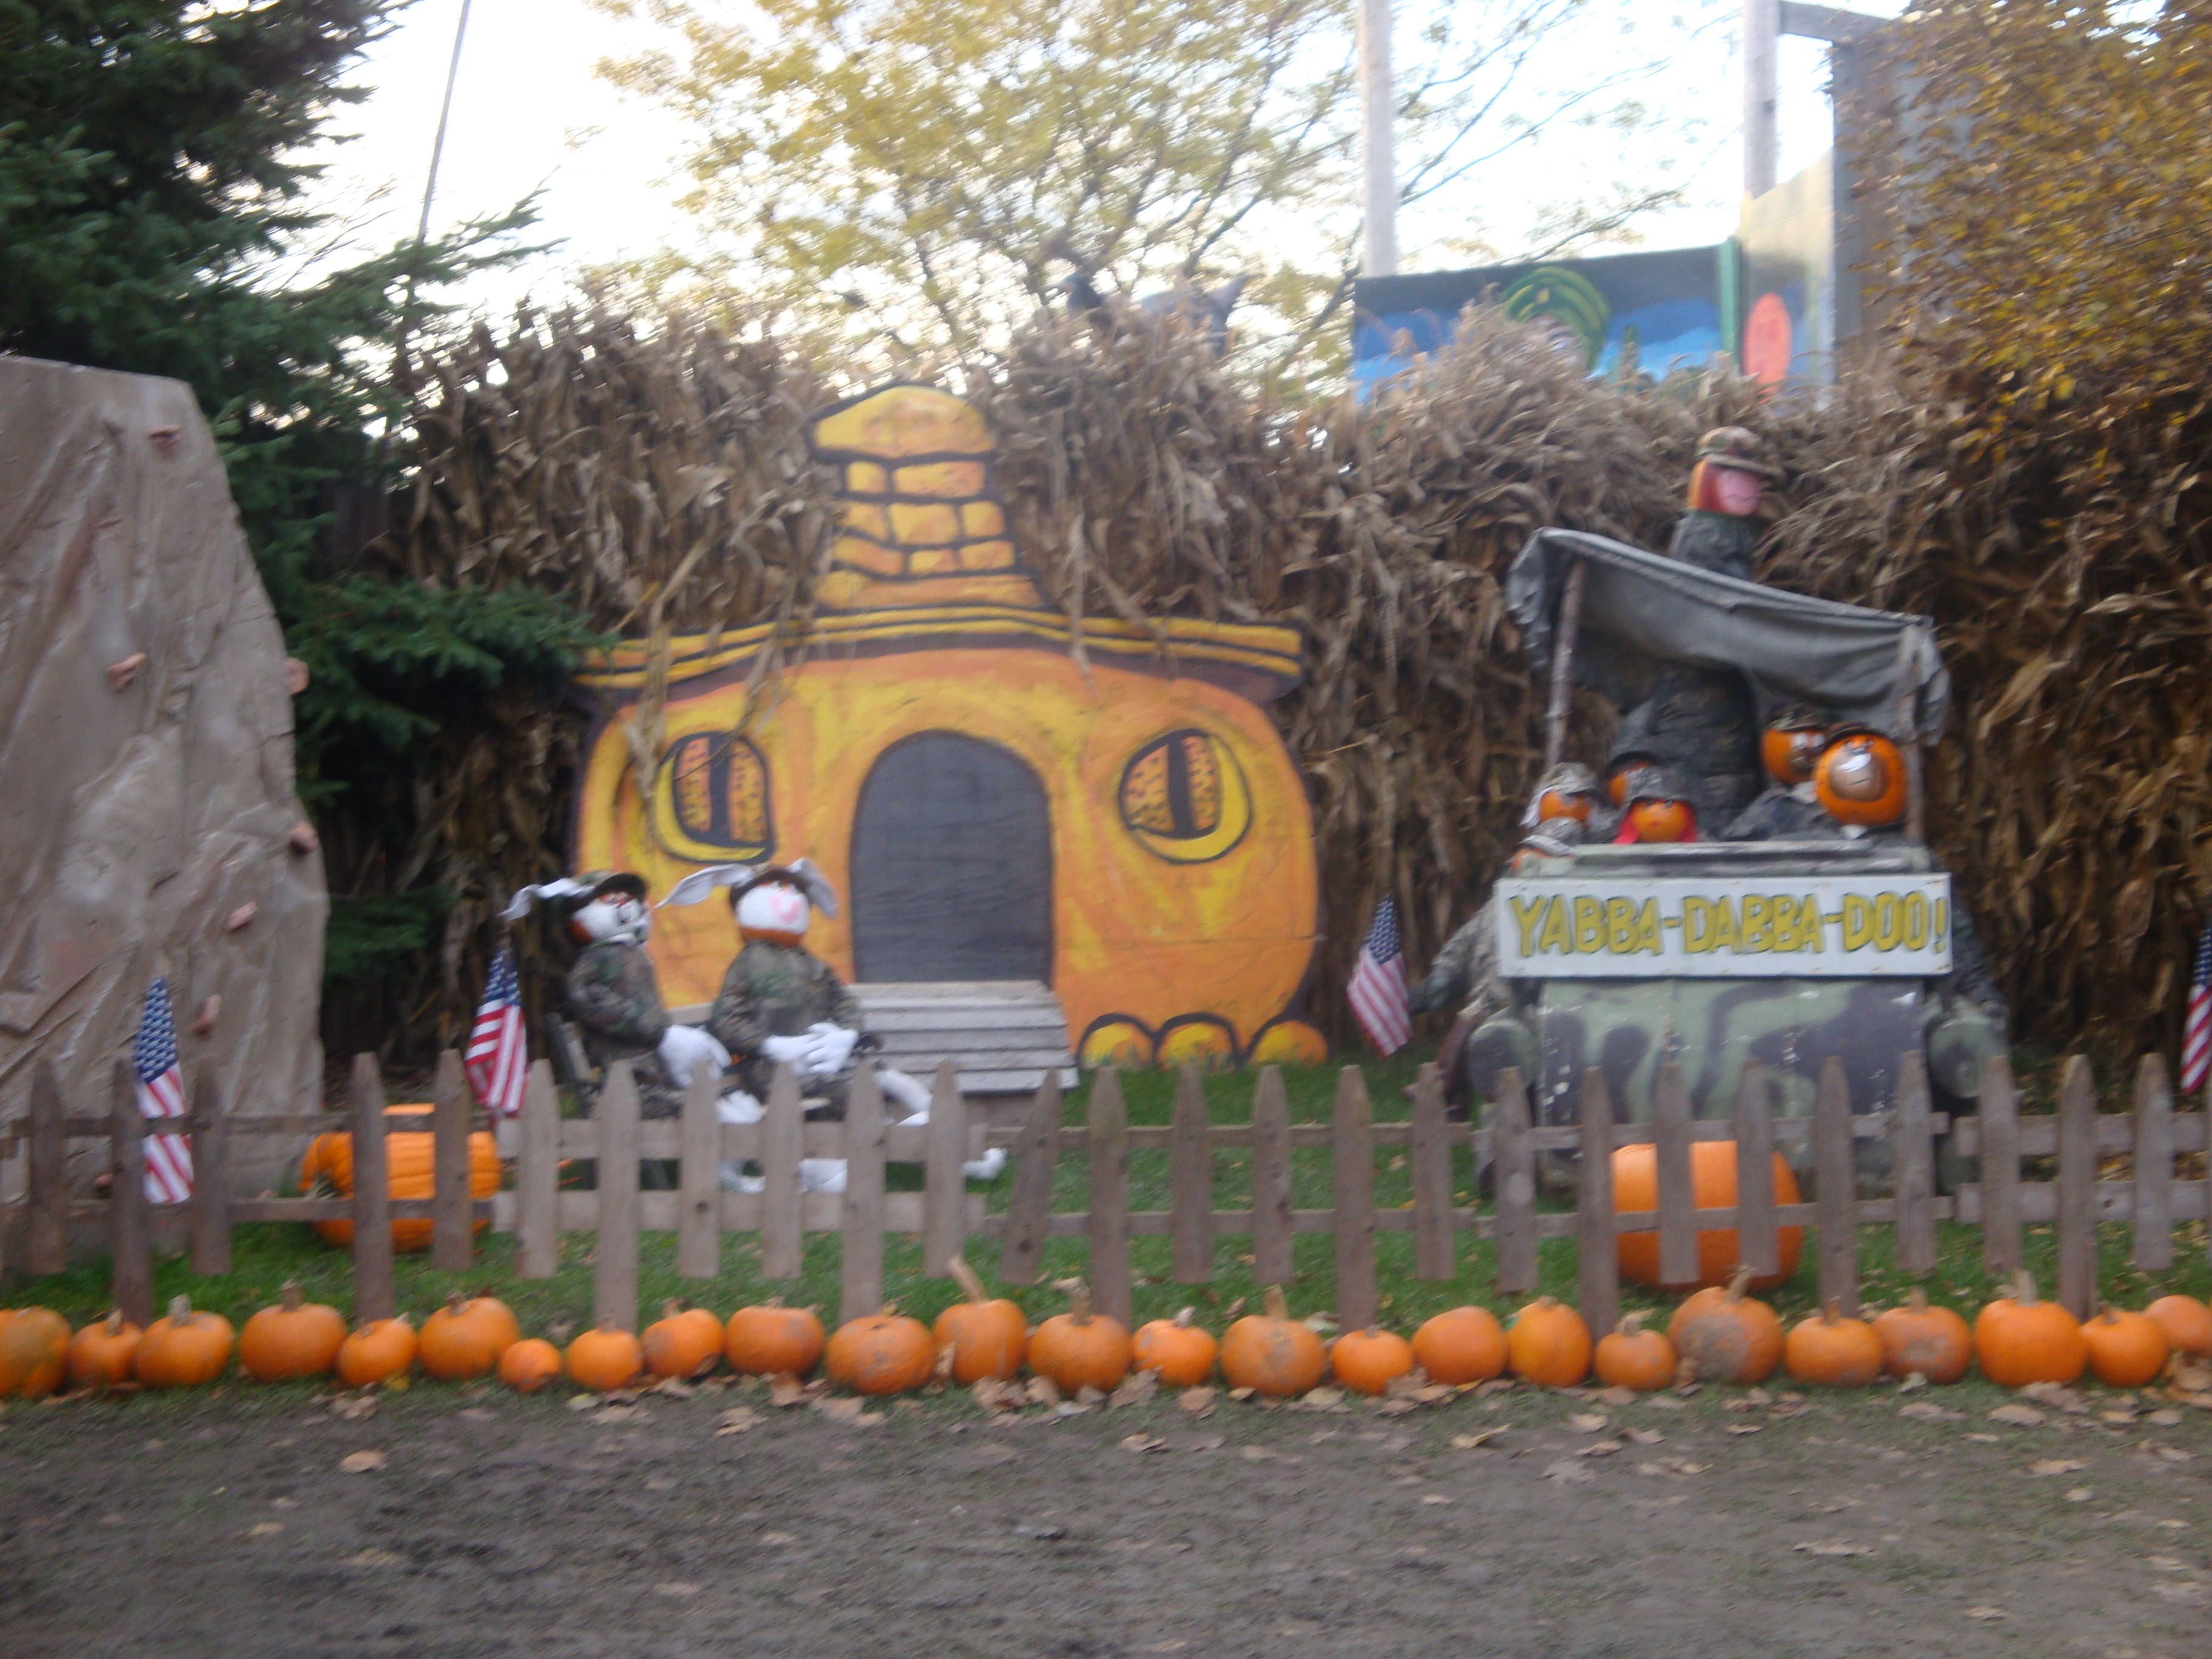 Jerry smith pumpkin farm jerry smith pumpkin farm